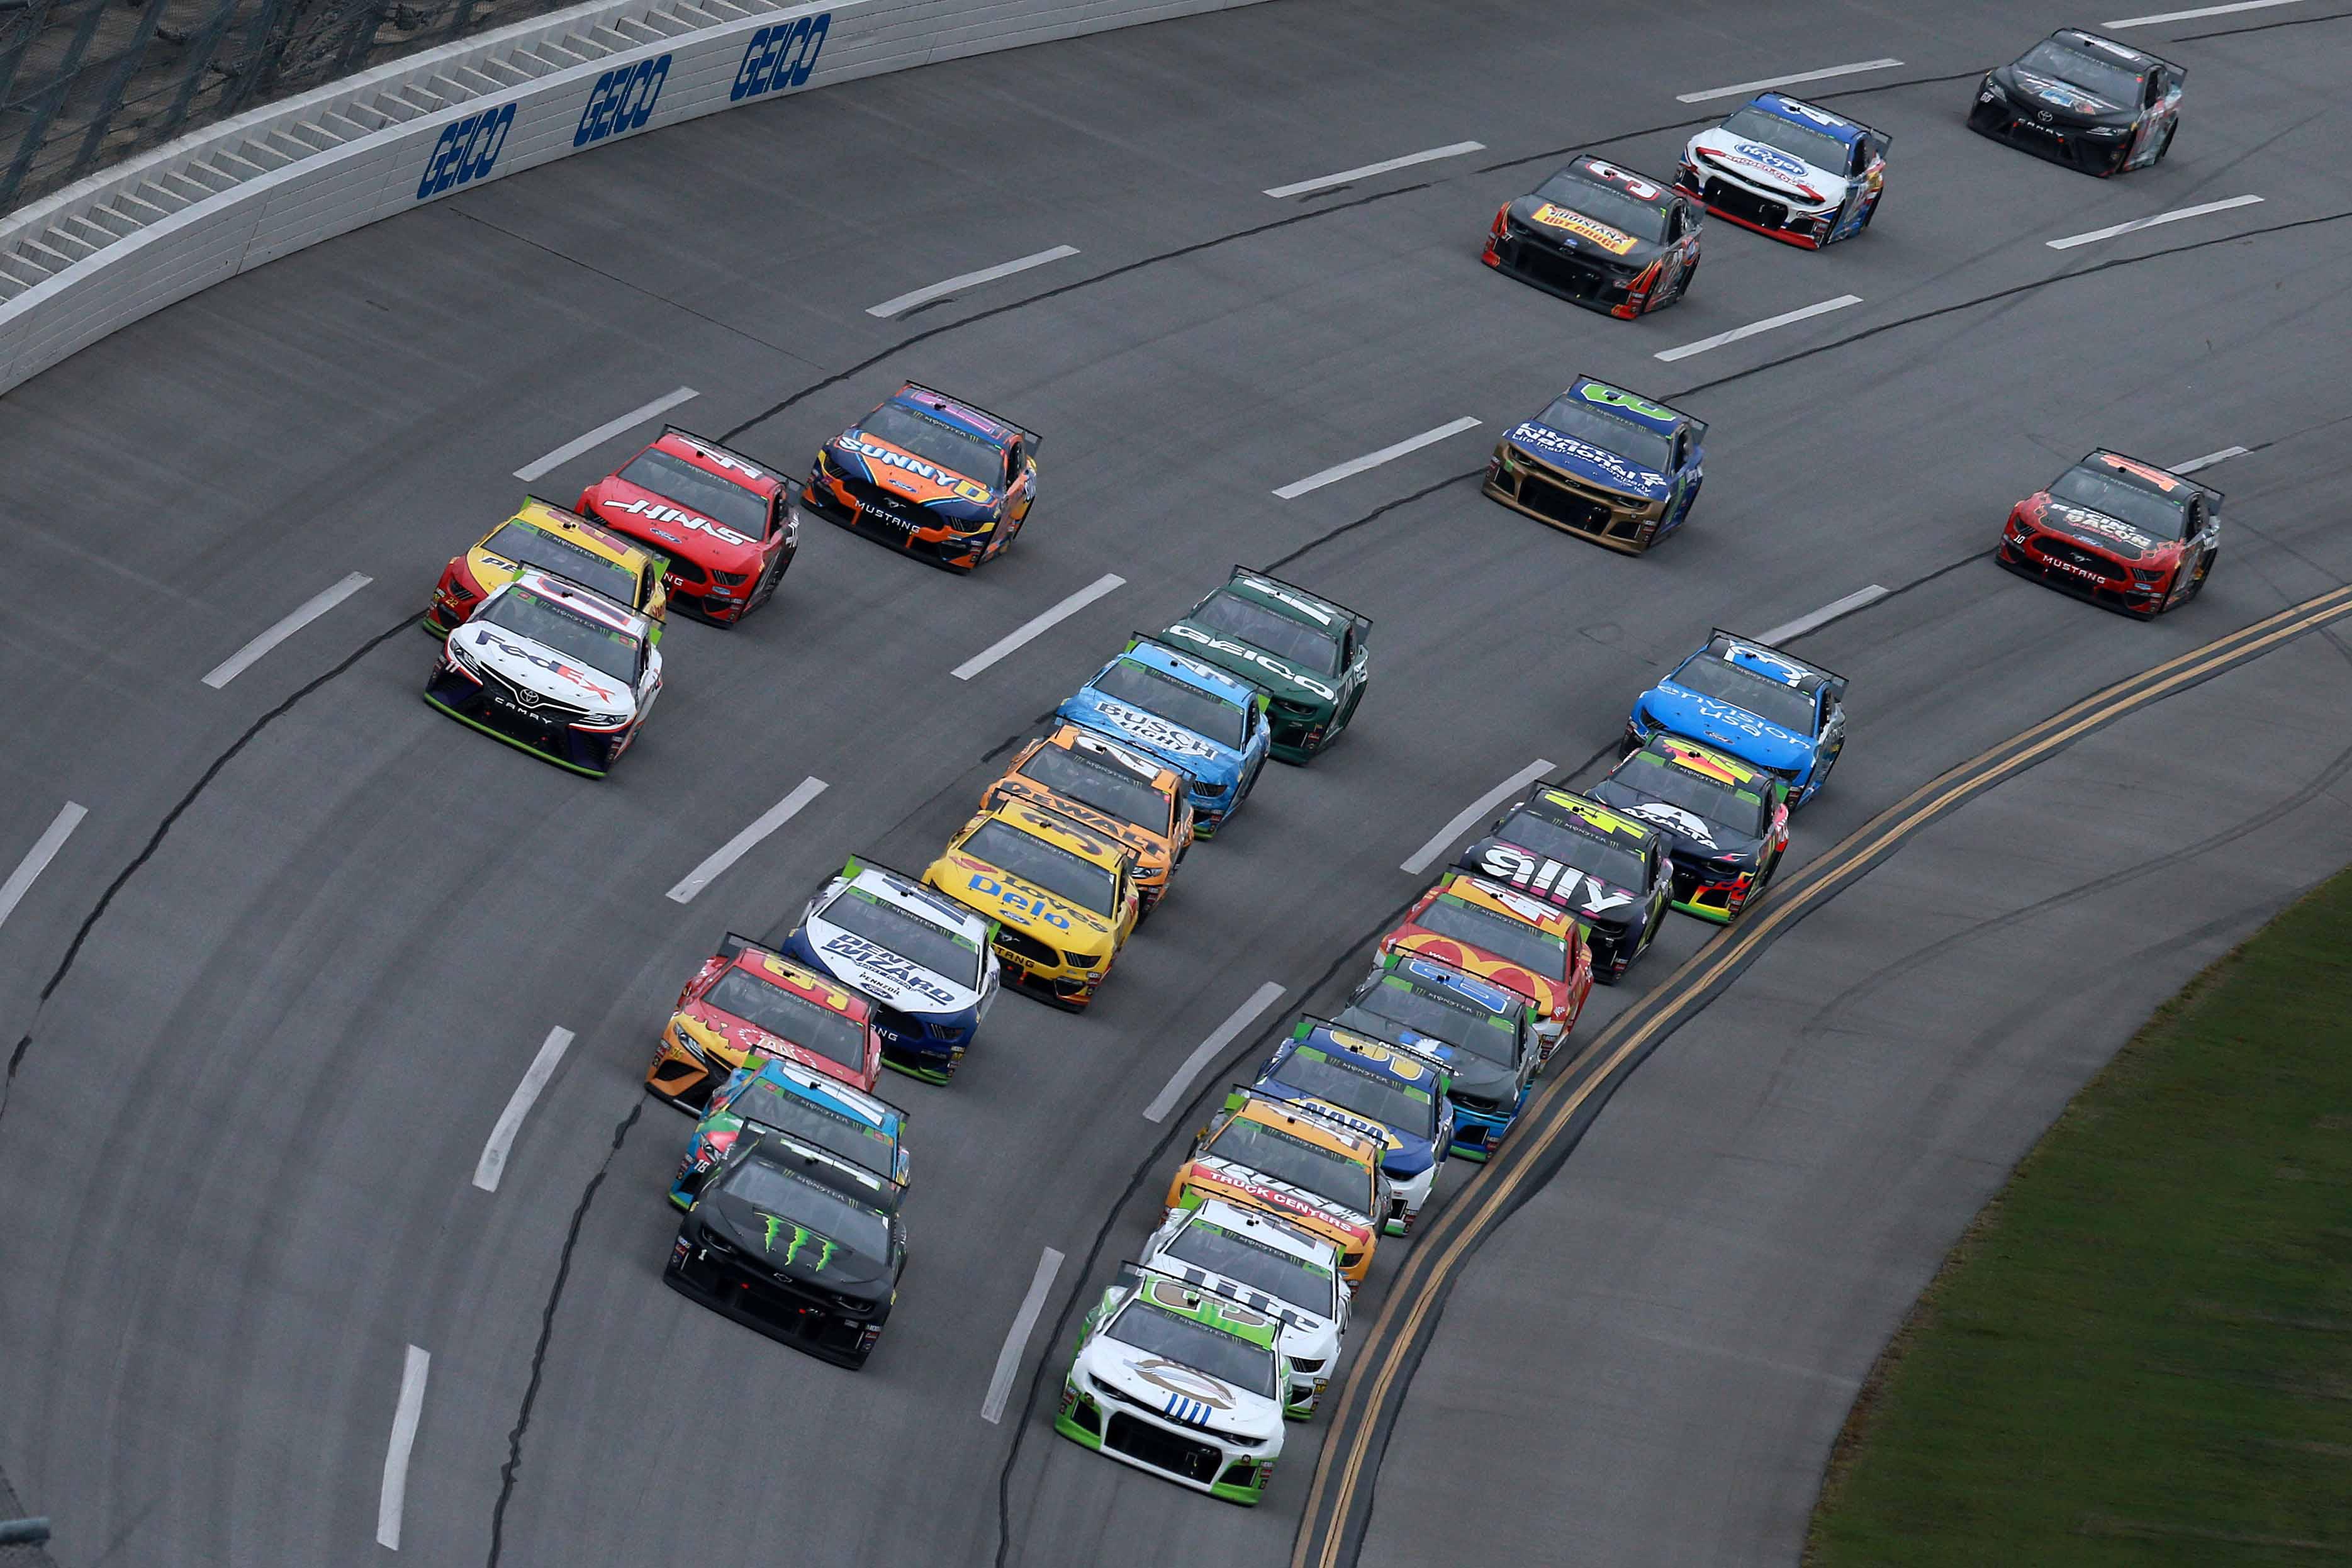 Kurt Busch and Austin Dillon lead the NASCAR race at Talladega Superspeedway